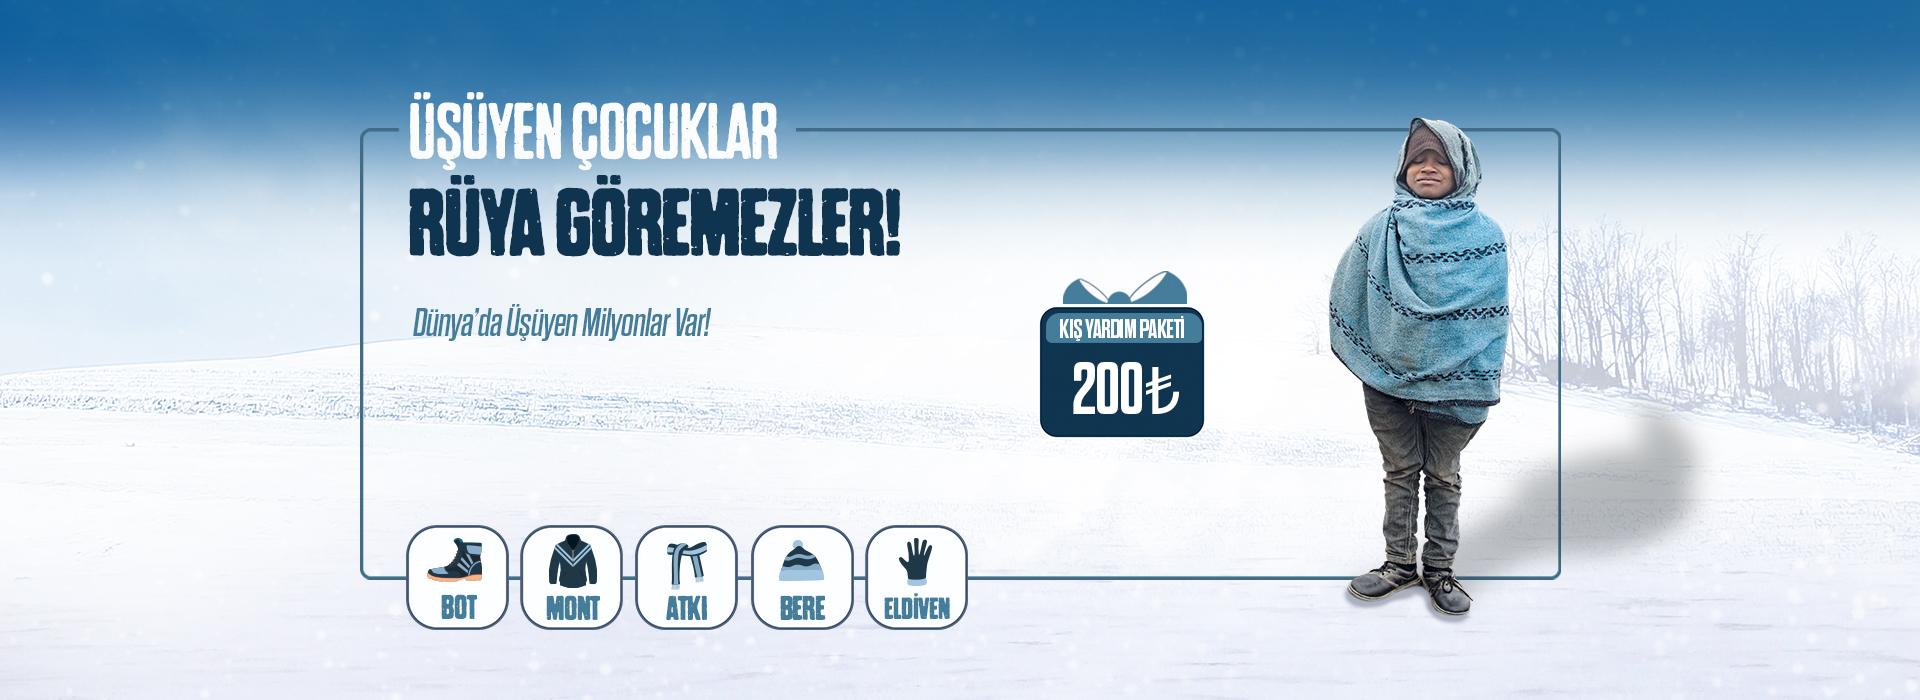 kardeşeli-kış-slider-1920x720.jpg